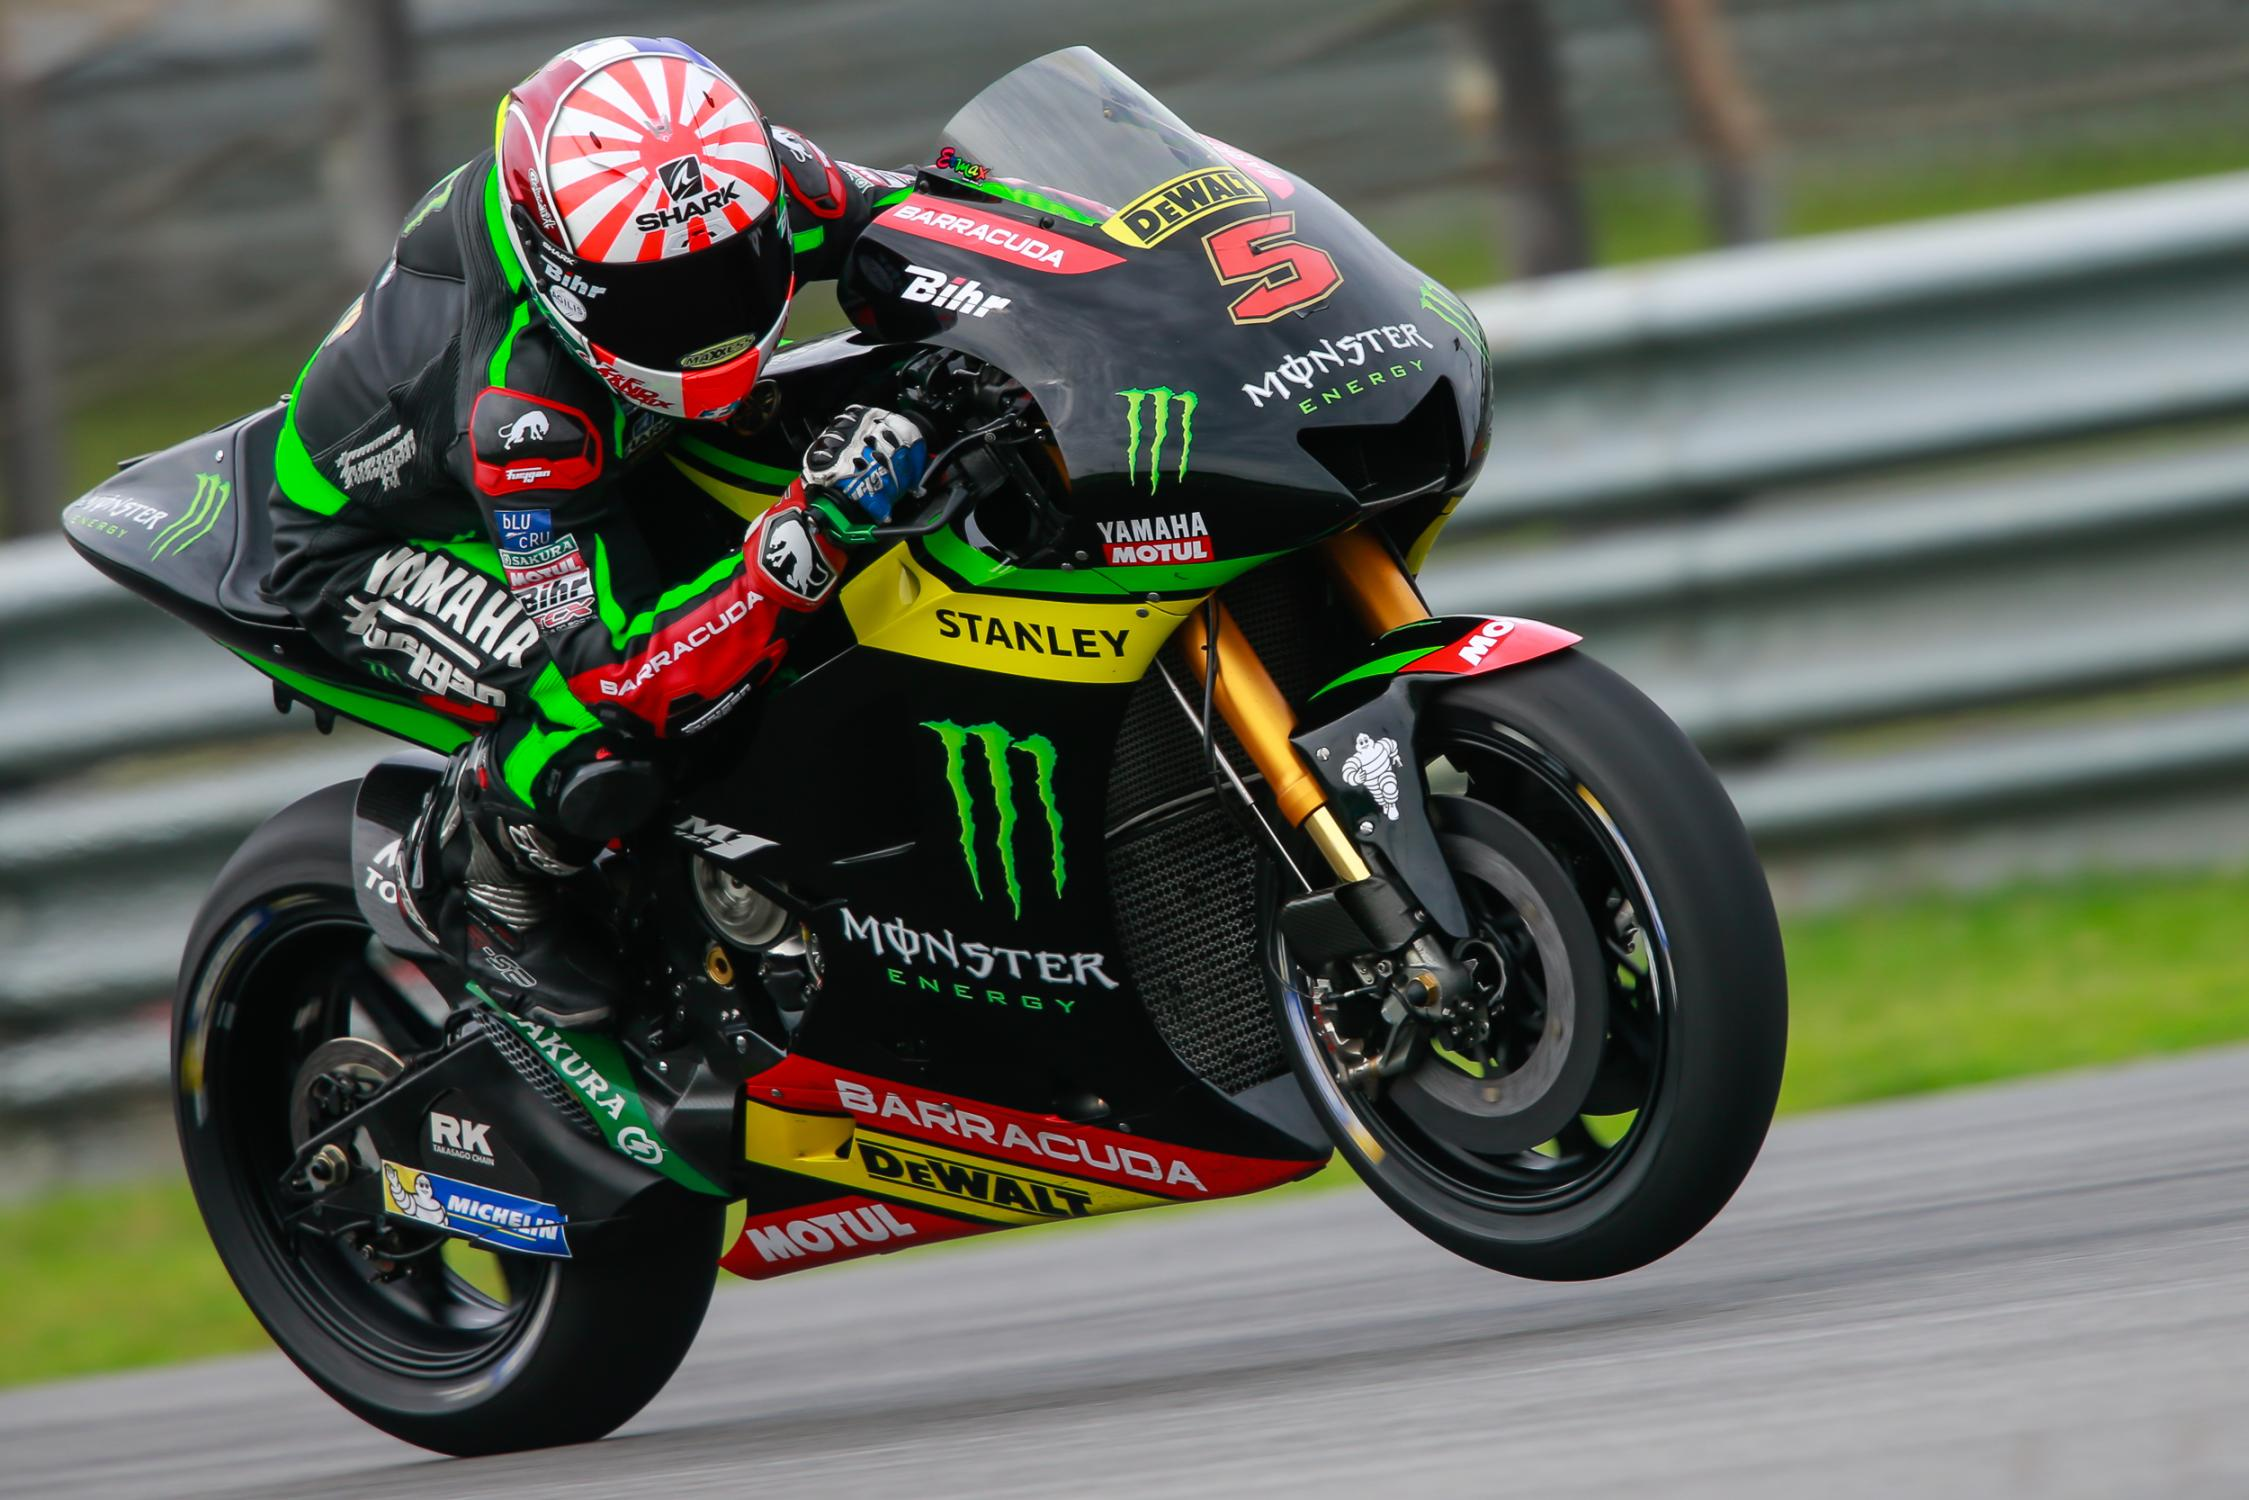 [MotoGP] Test Sepang 05-johann-zarco-fra_gp_1126.gallery_full_top_fullscreen